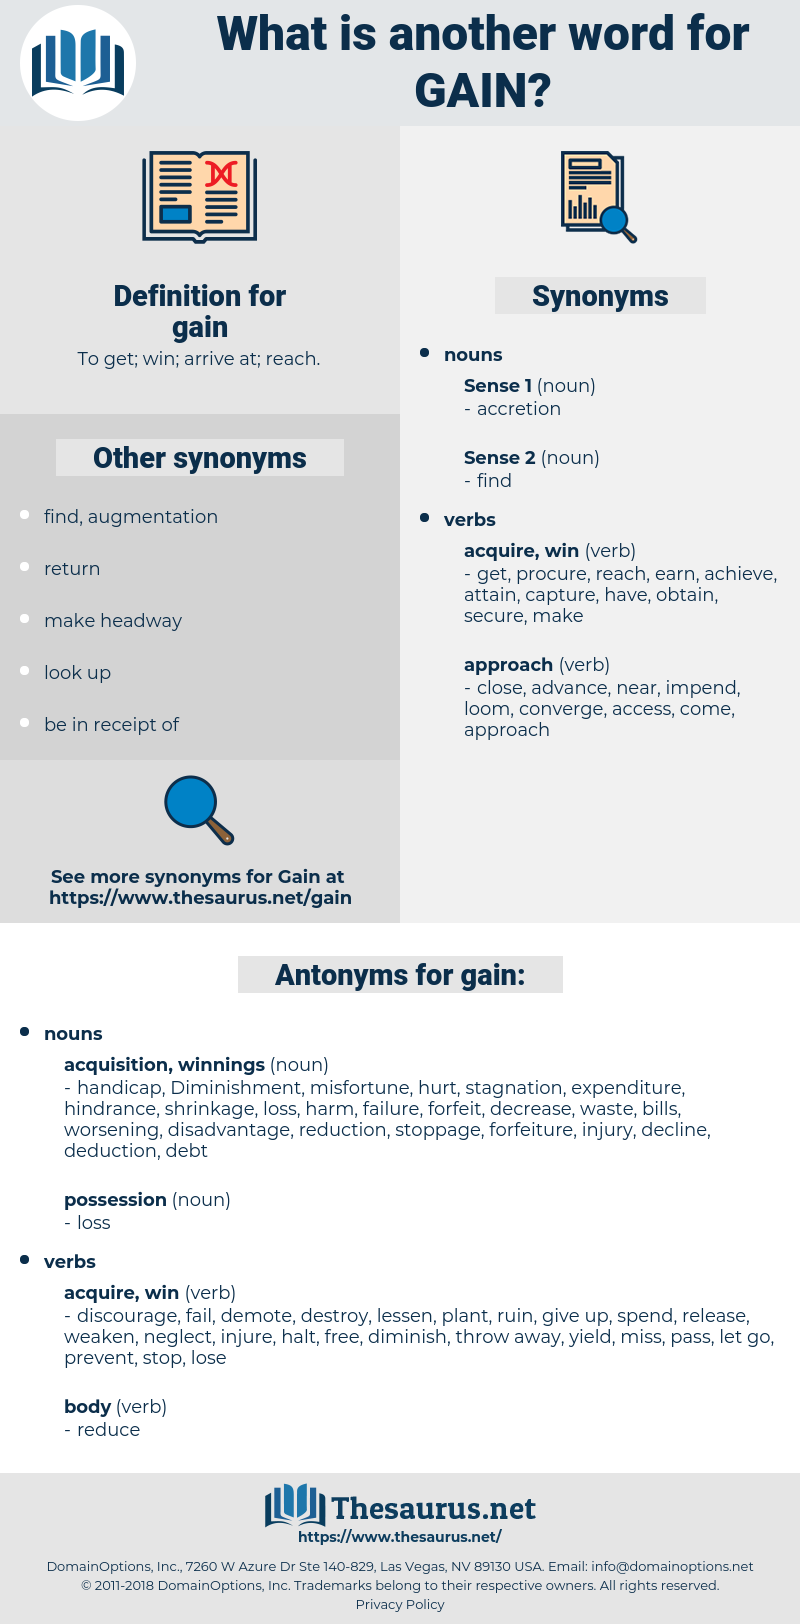 gain, synonym gain, another word for gain, words like gain, thesaurus gain